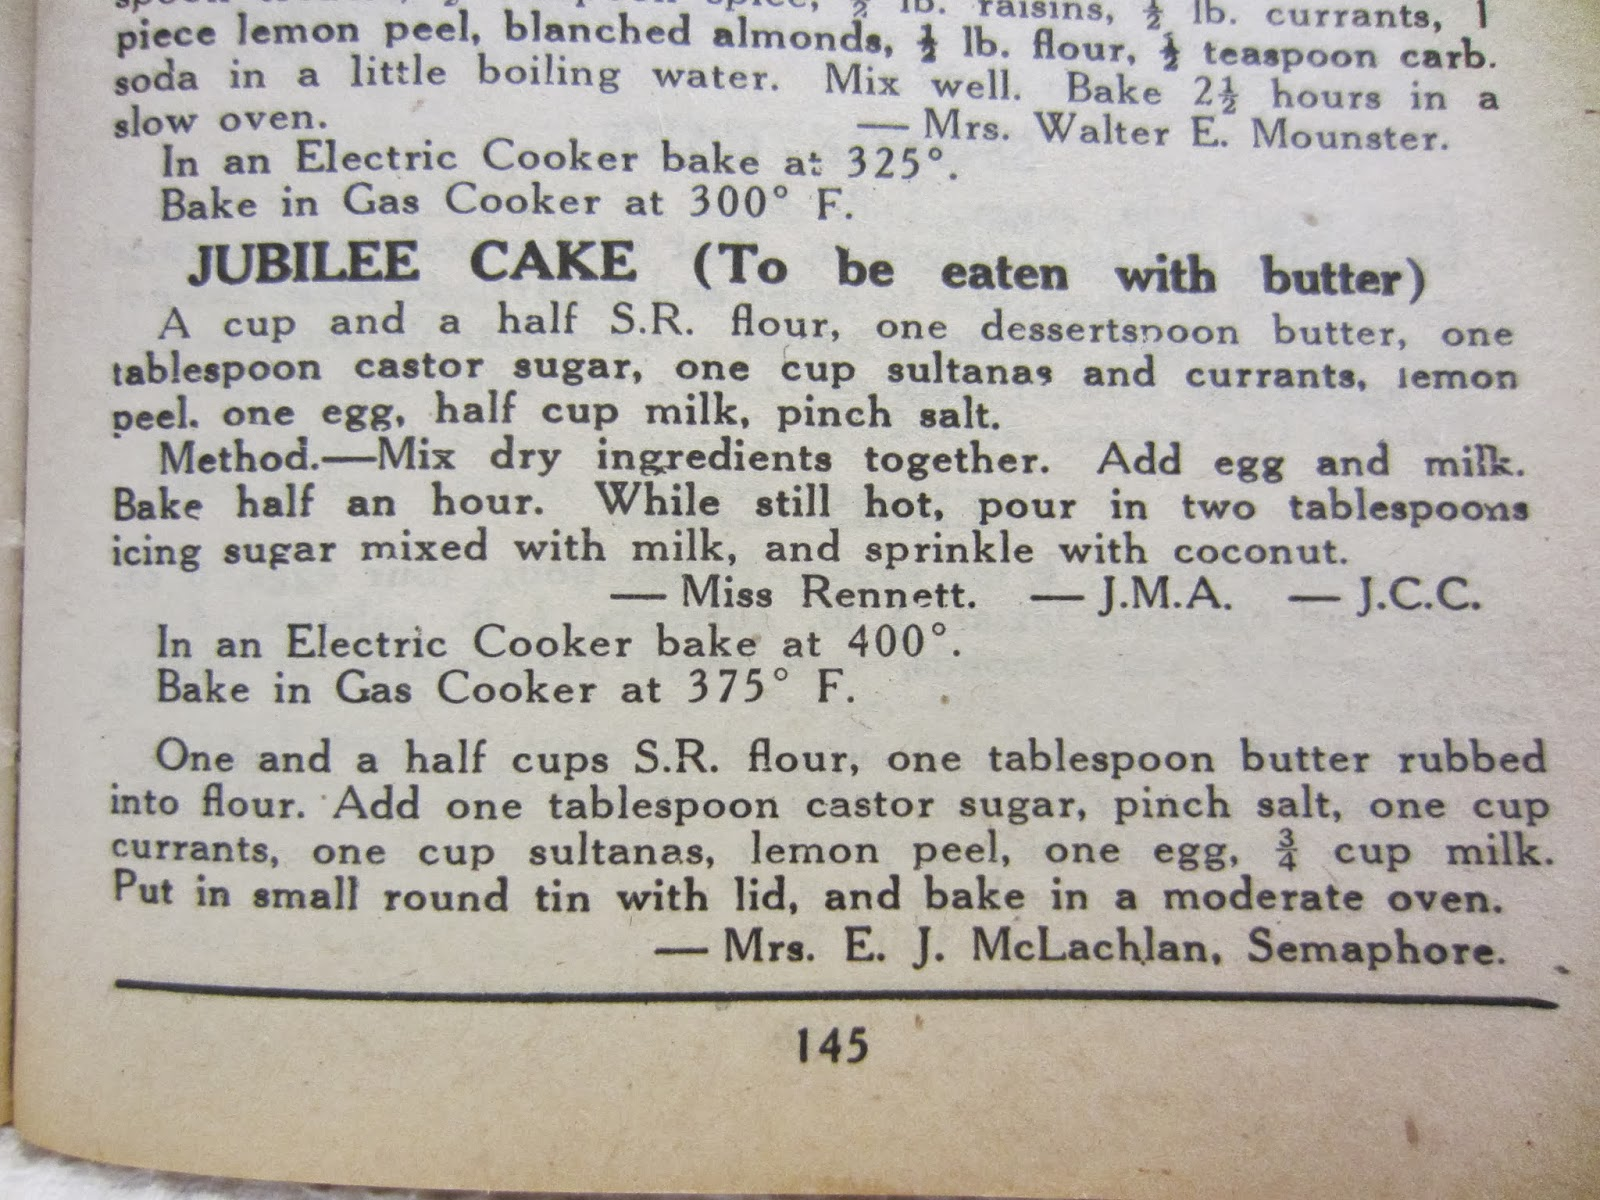 Cwa Jubilee Cake Recipe